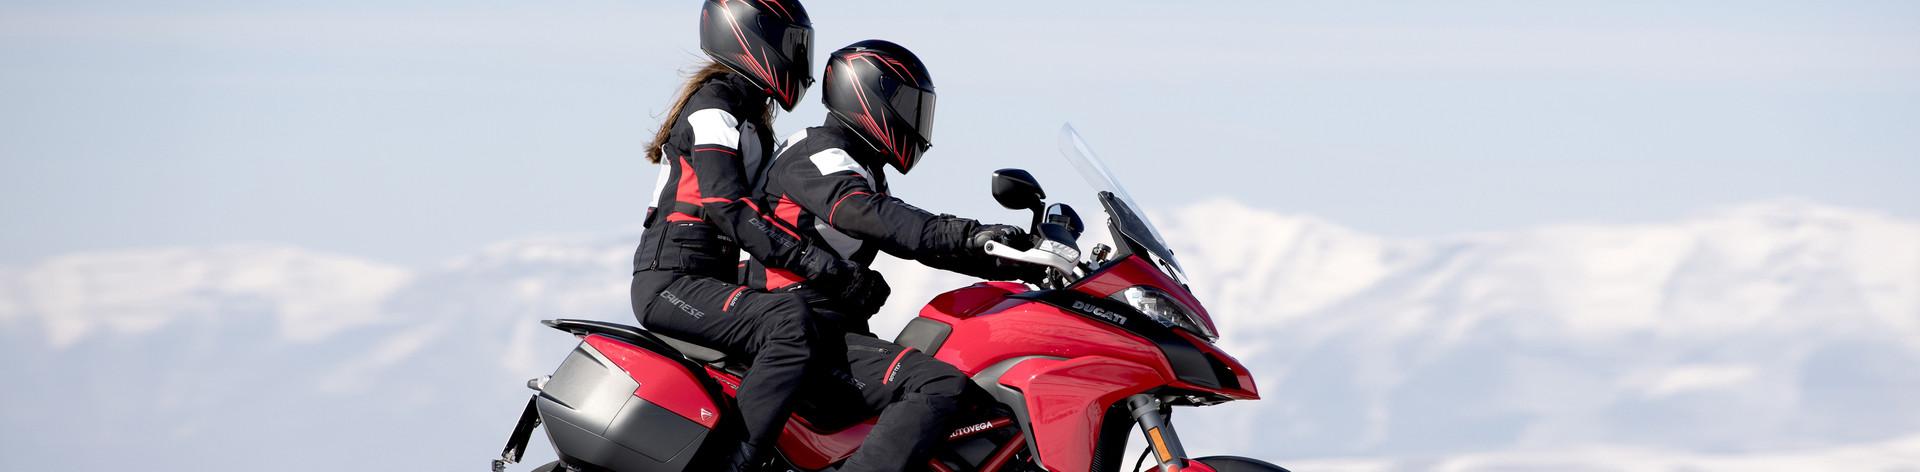 Dainese Motorrad